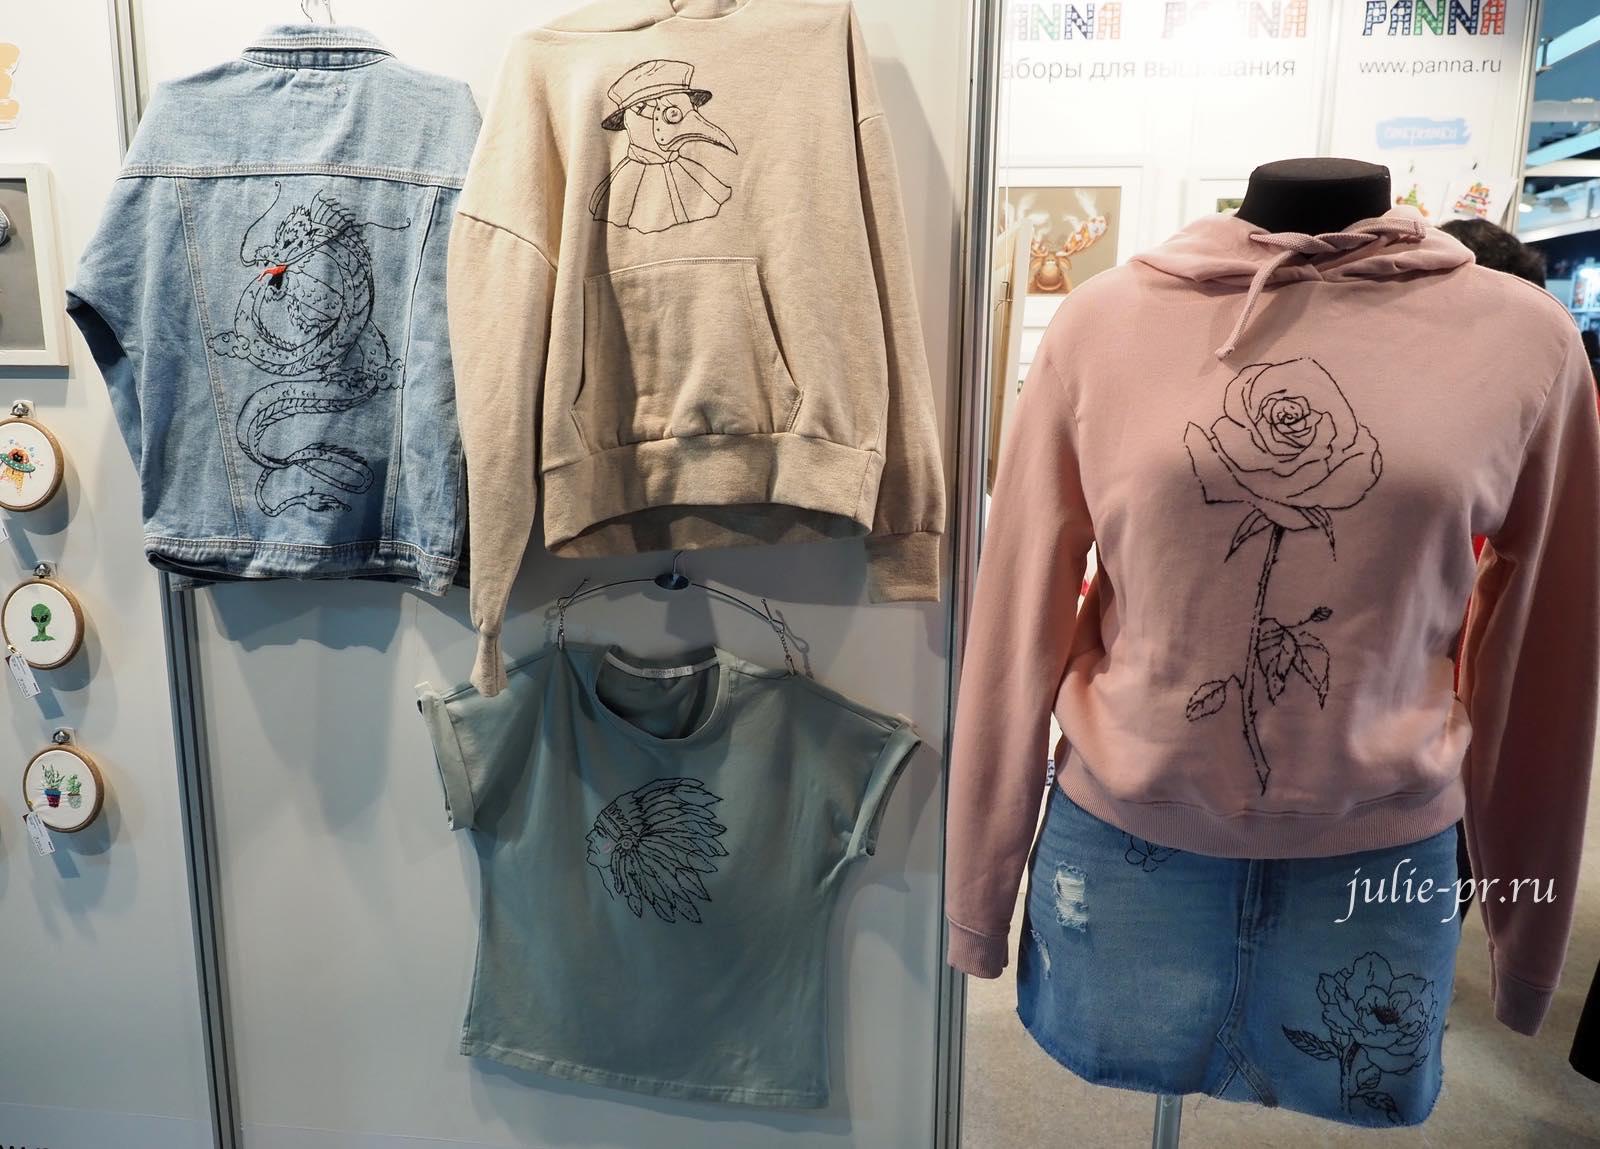 панна, формула рукоделия осень 2021, вышивка гладью, выставка, вышивка на одежде